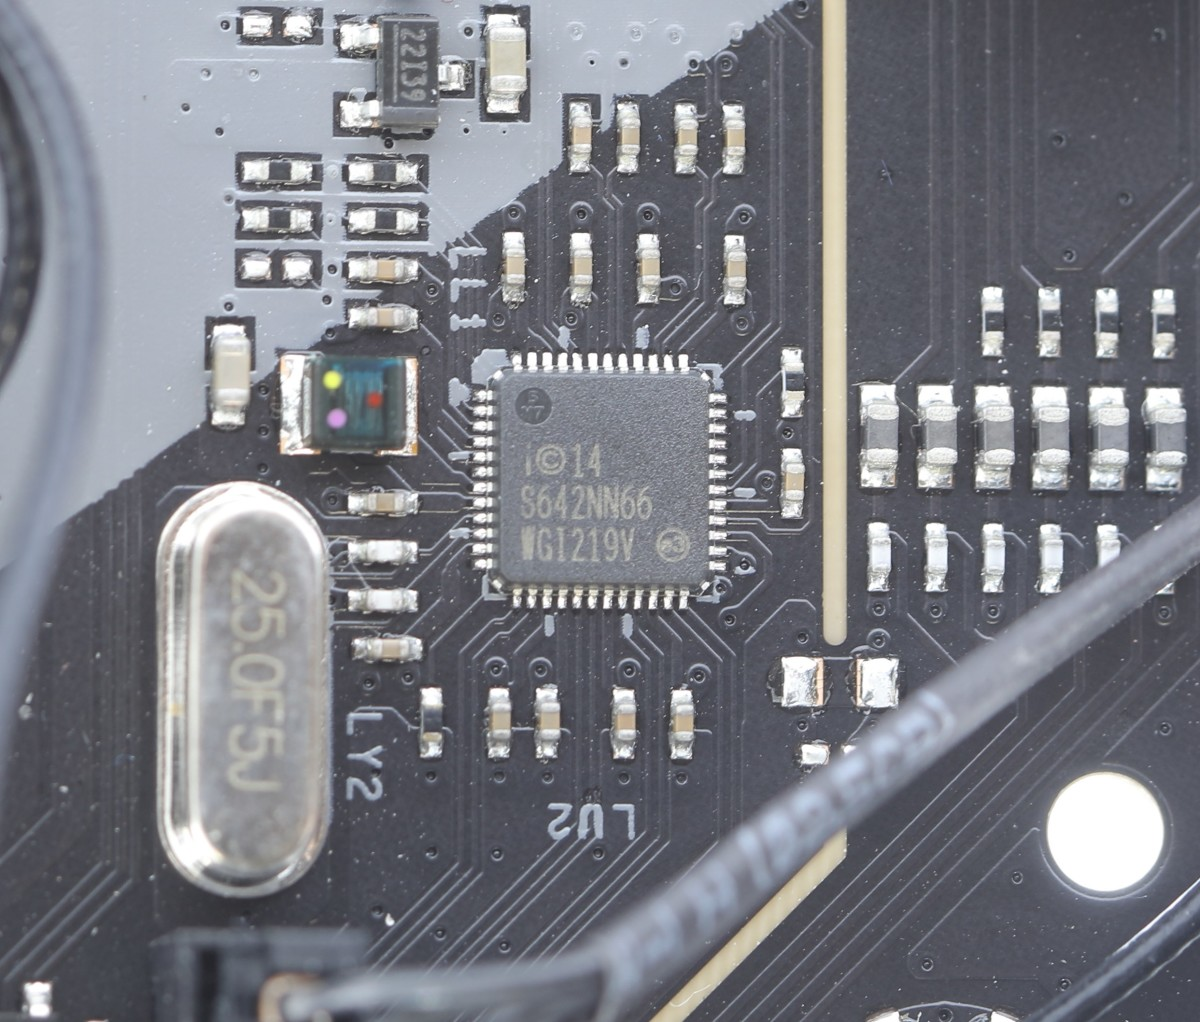 固網功能採用 Intel I219-V Gigabit LAN 晶片